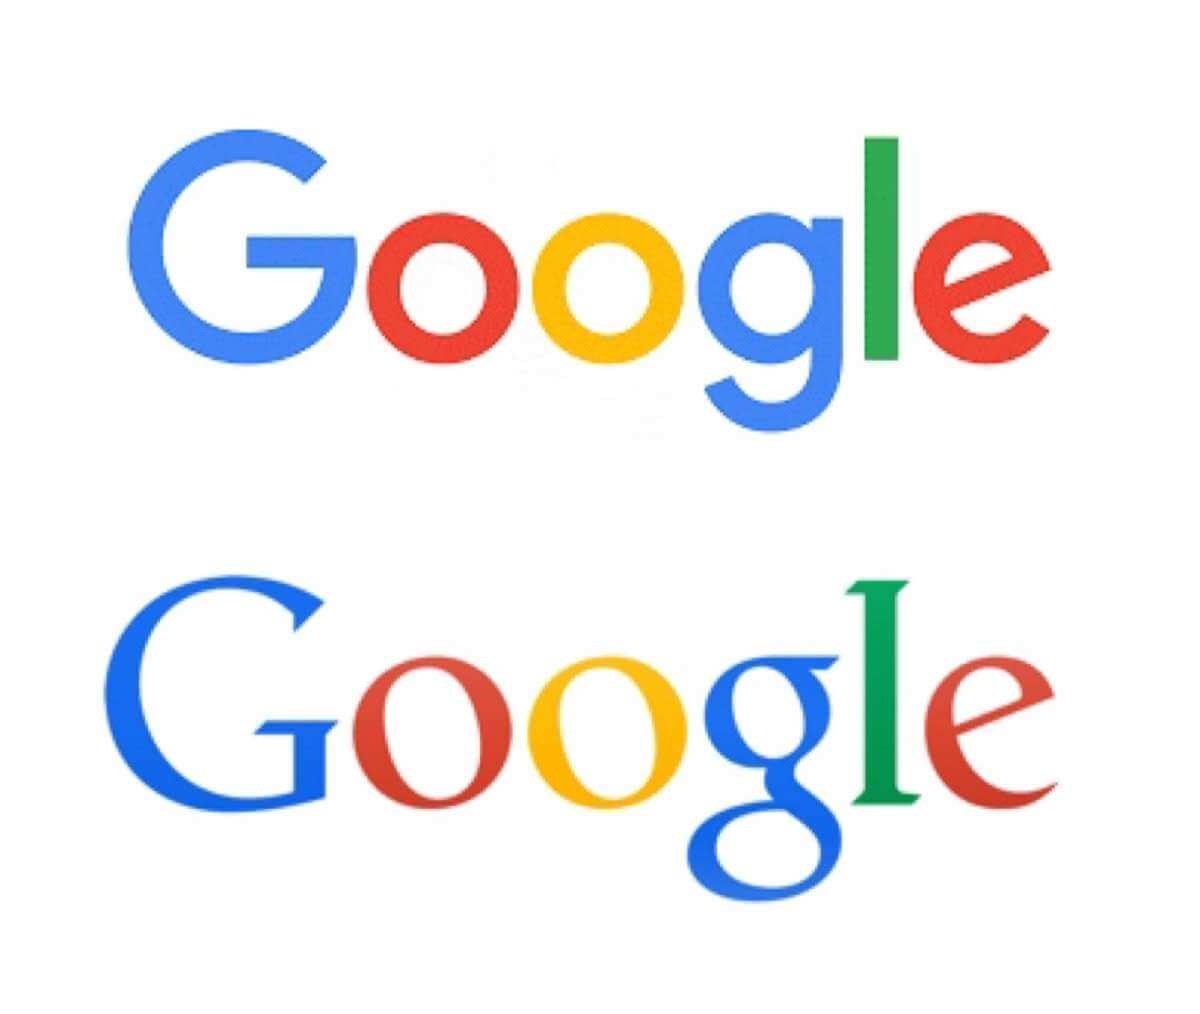 Google Logos | Web Design Trends